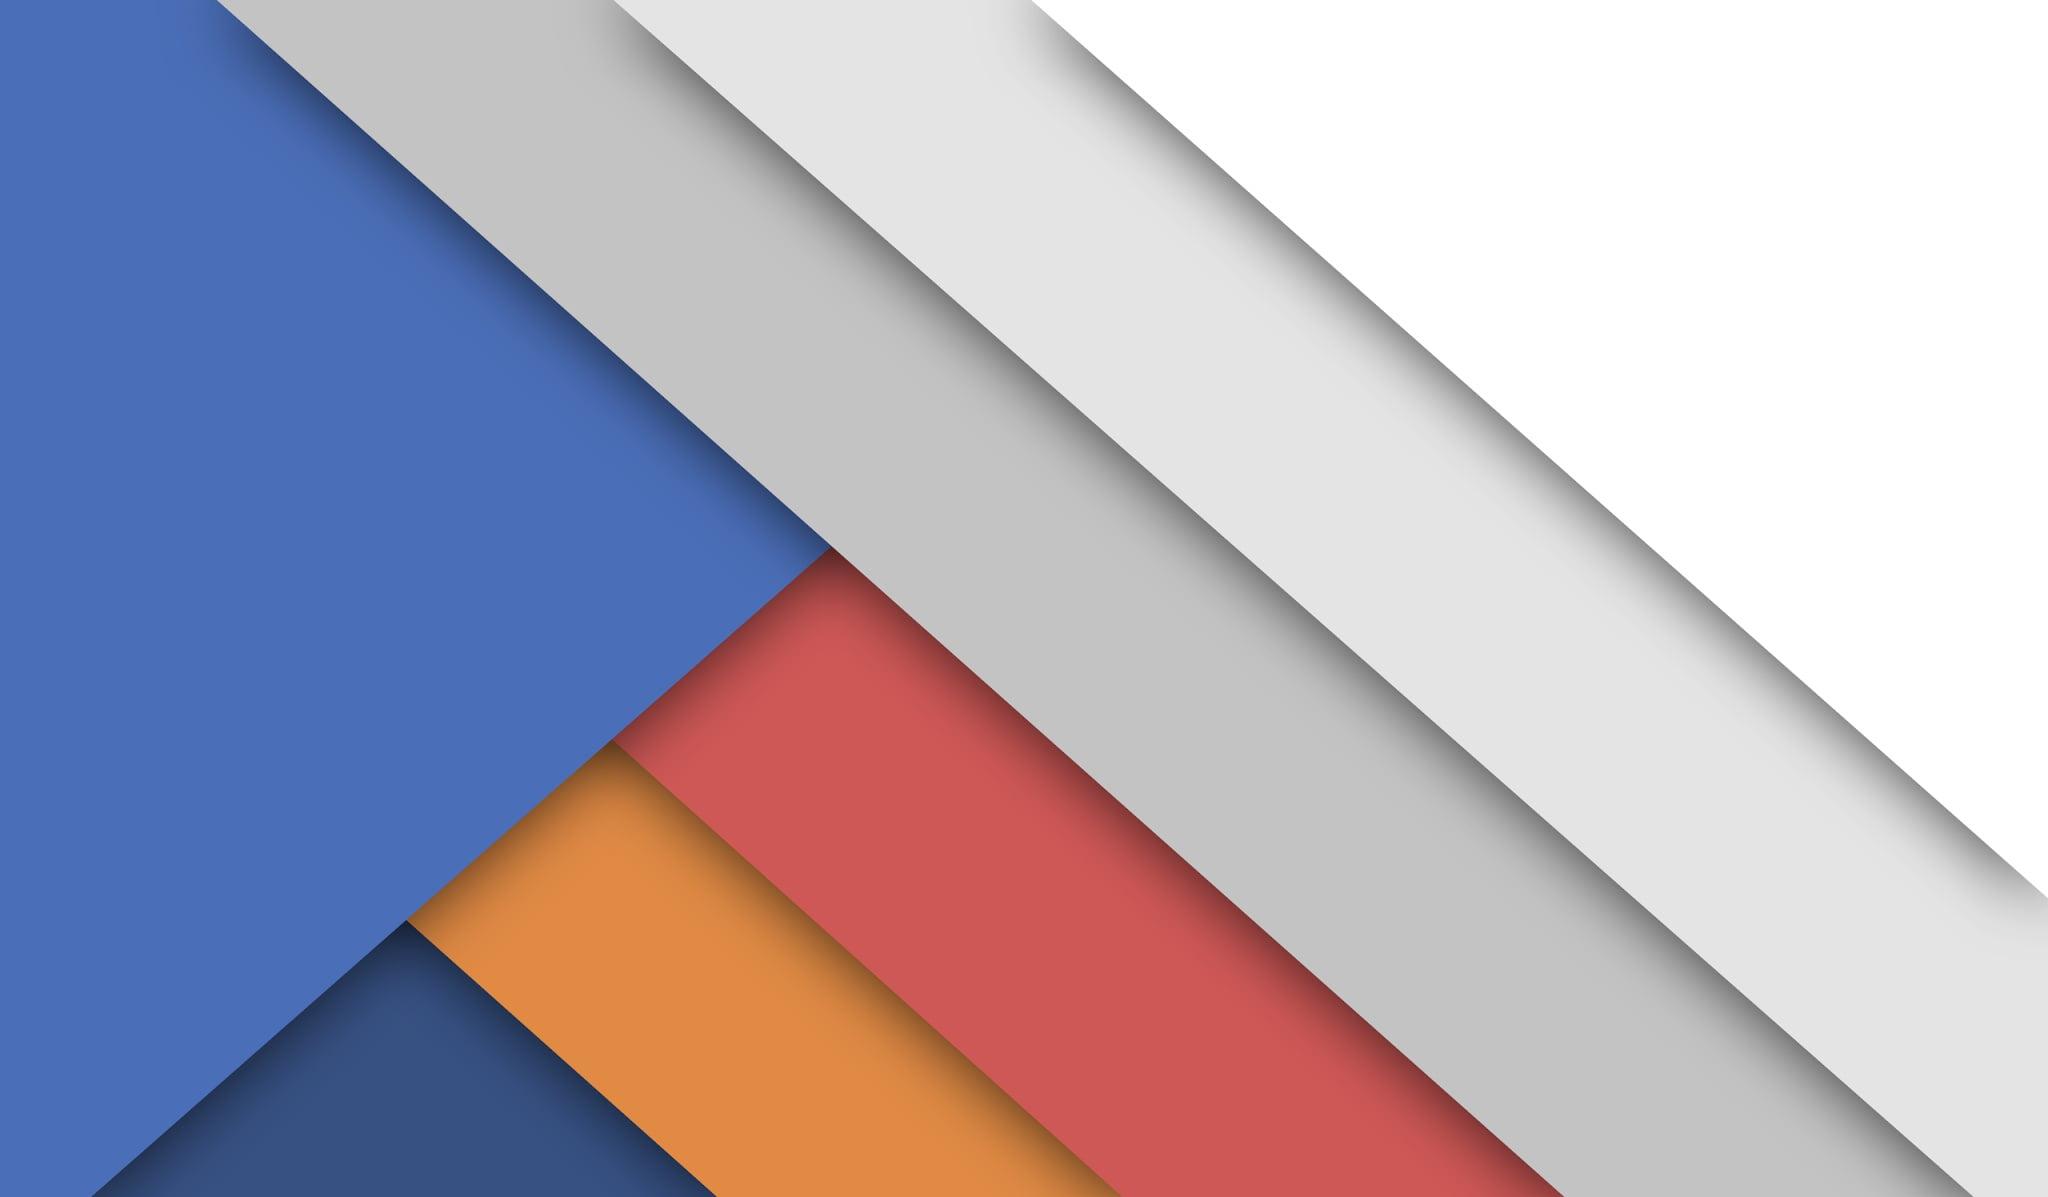 Abstract Lines Wallpaper Hd - HD Wallpaper